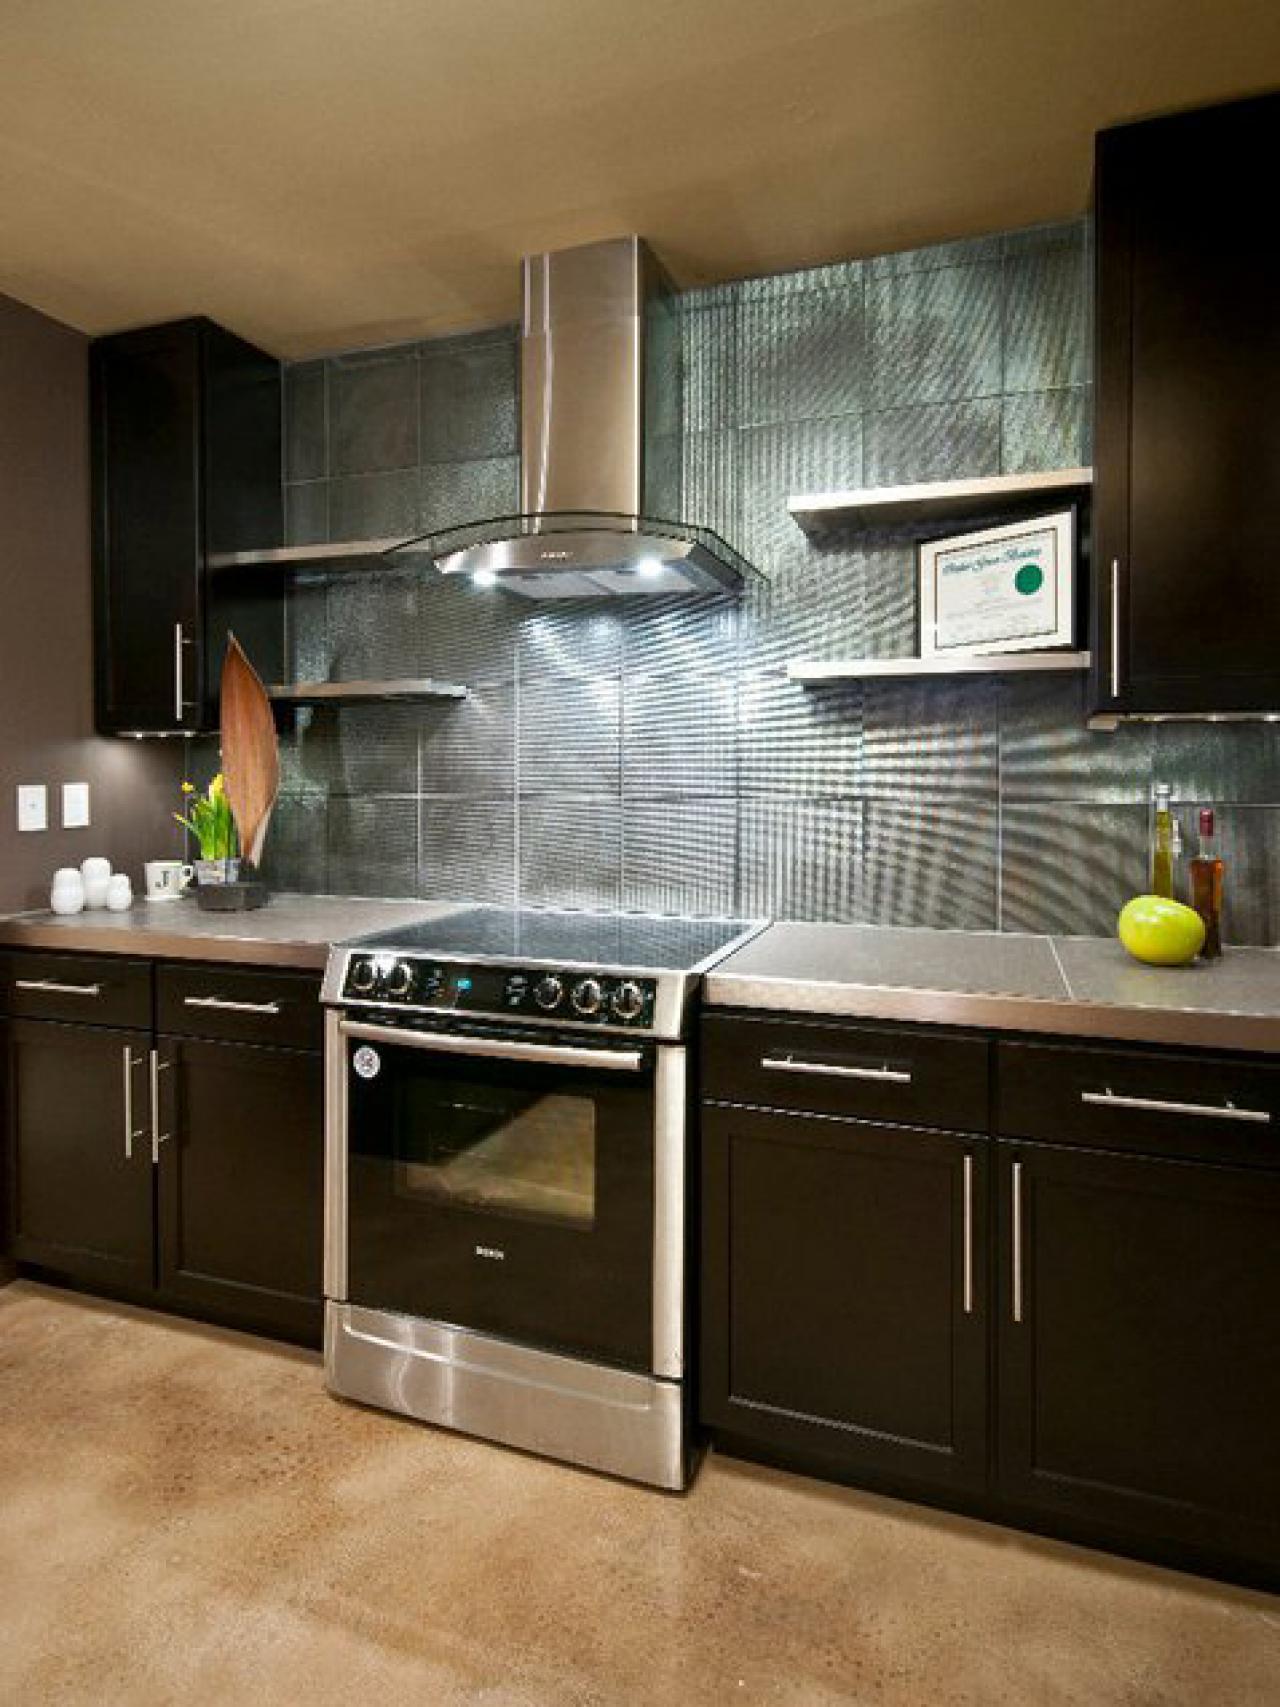 Uncategorized Modern Backsplash Ideas For Kitchen modern kitchen backsplash images doityourself diy ideas hgtv pictures hgtv